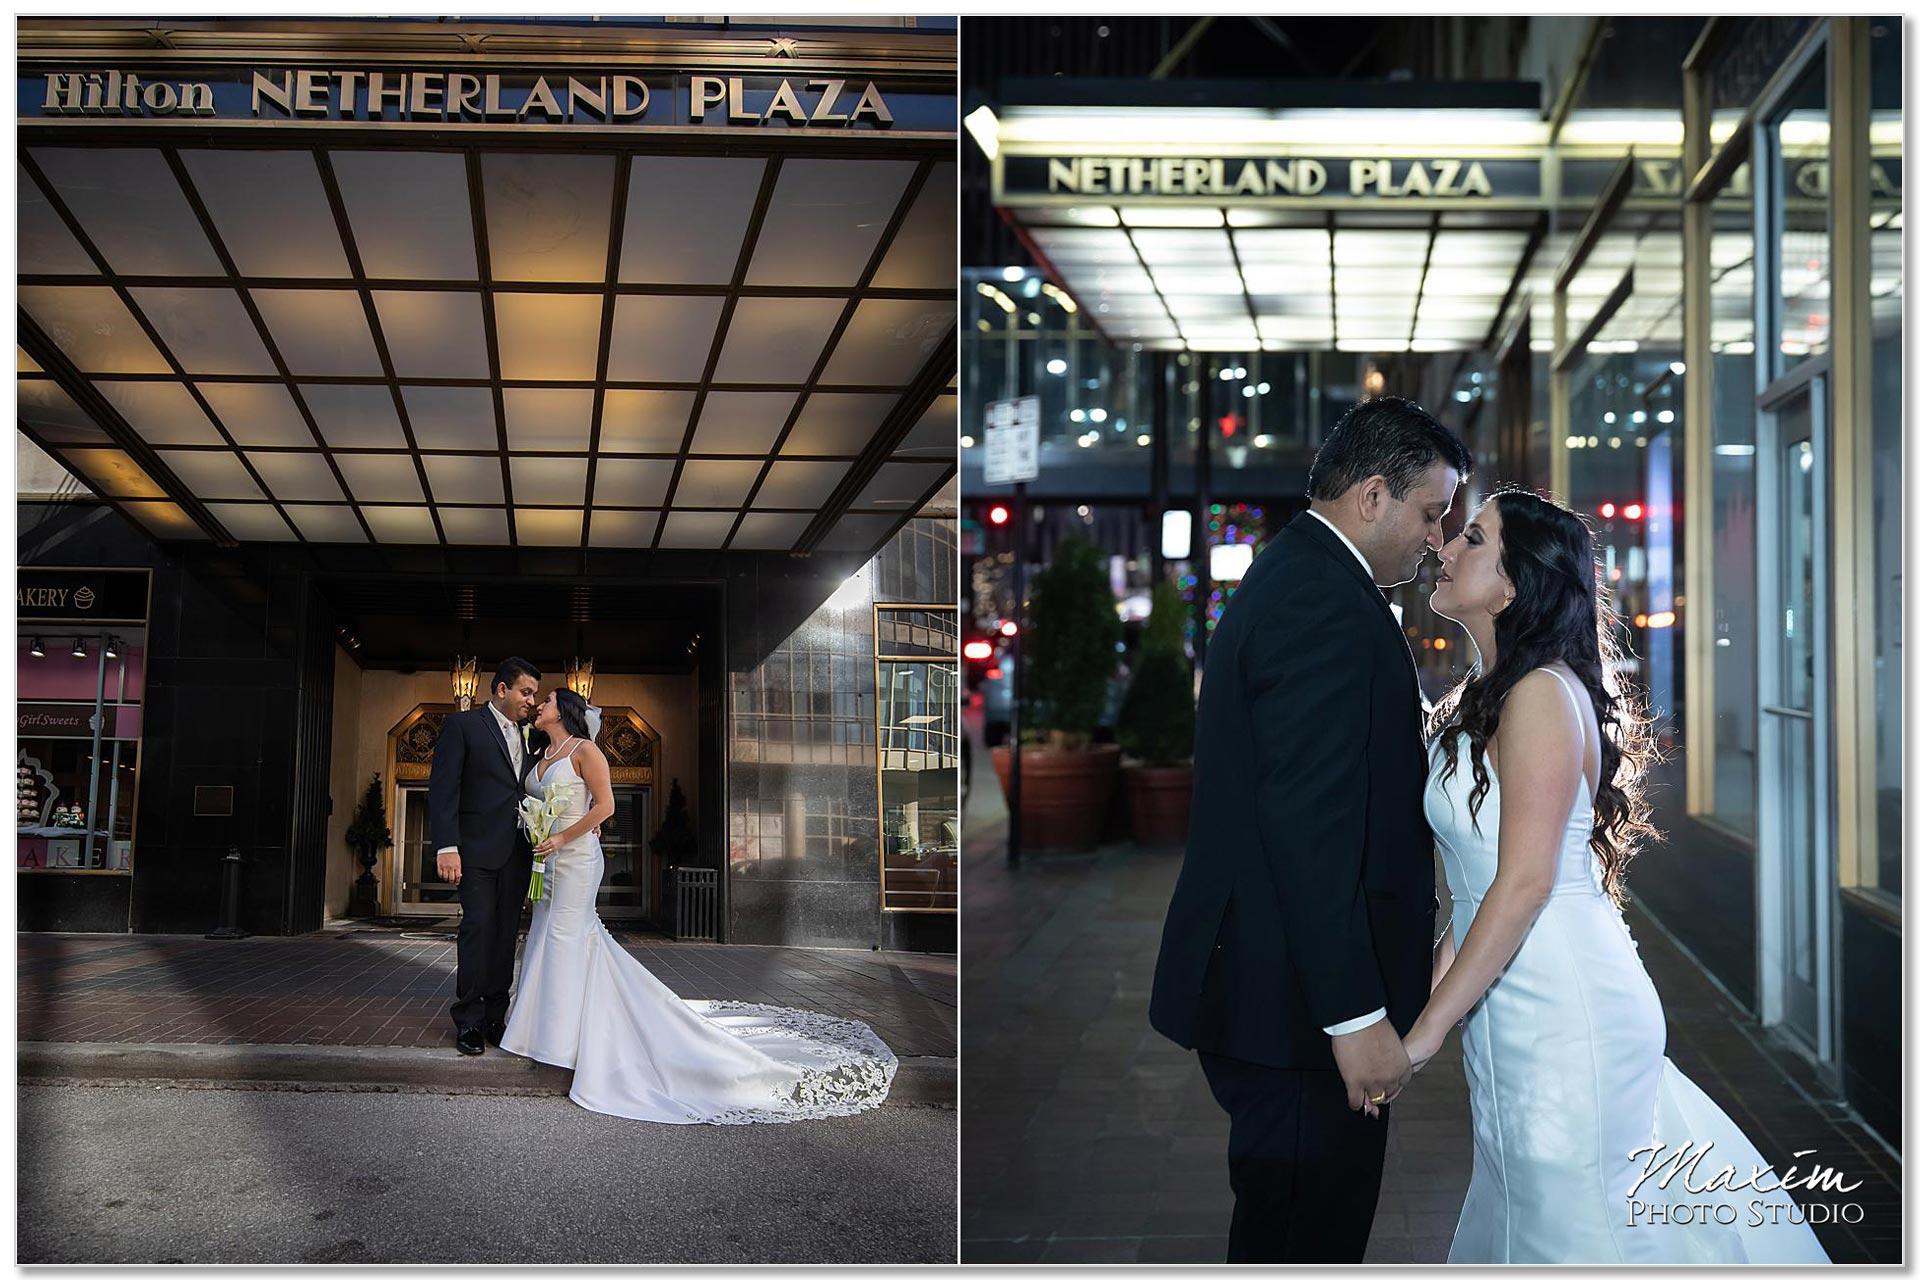 Hilton Netherland Plaza wedding portraits